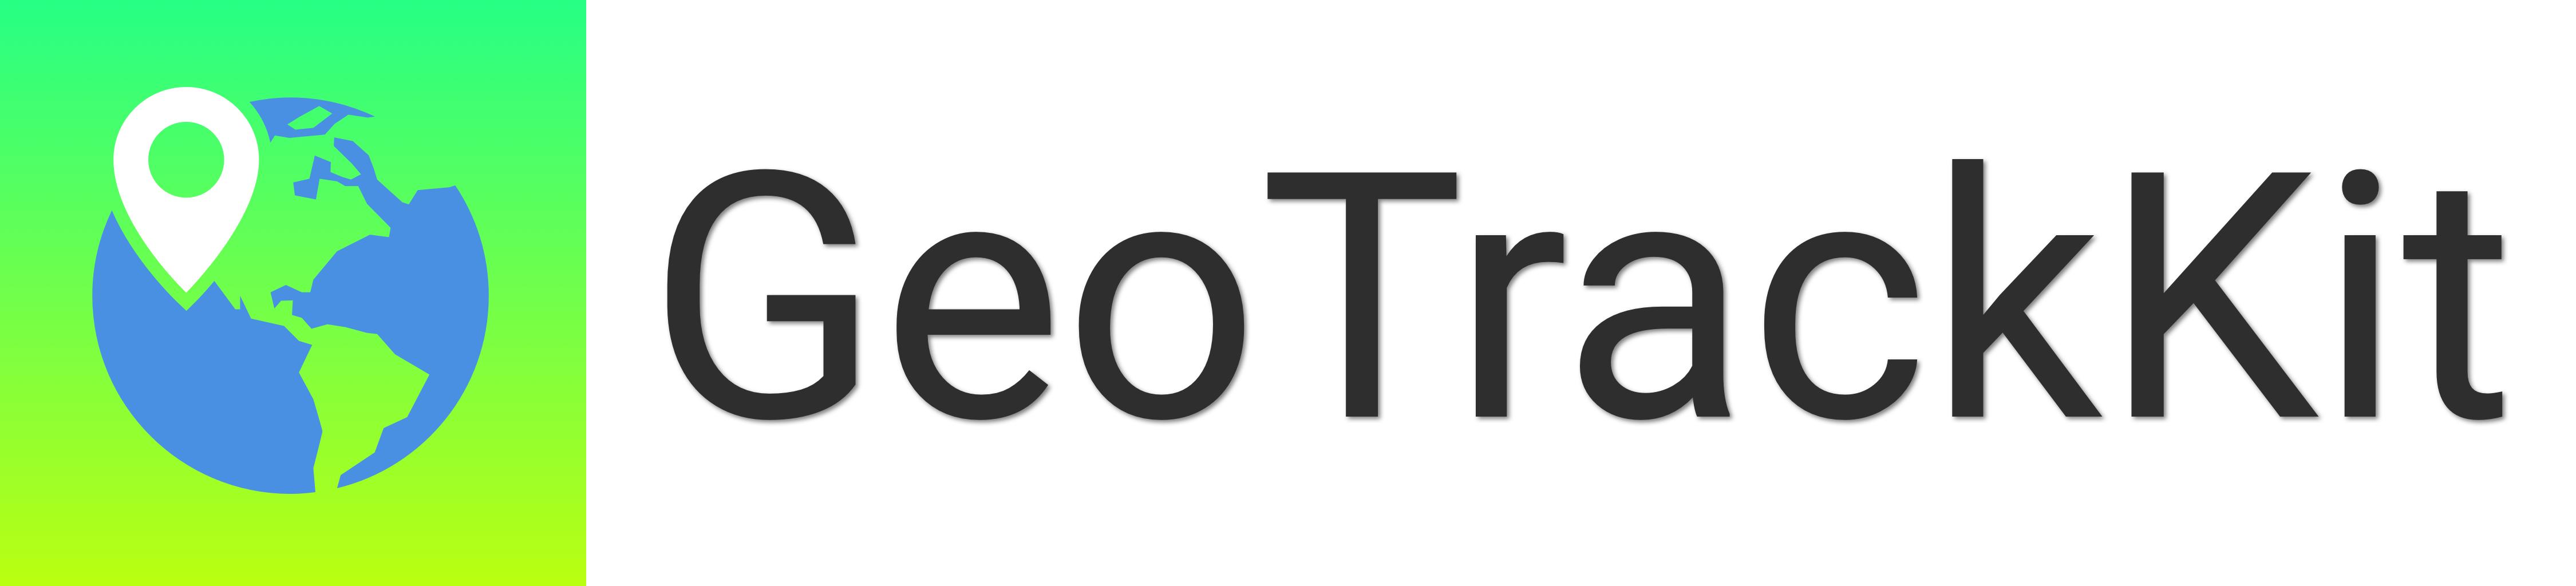 GeoTrackKit Logo